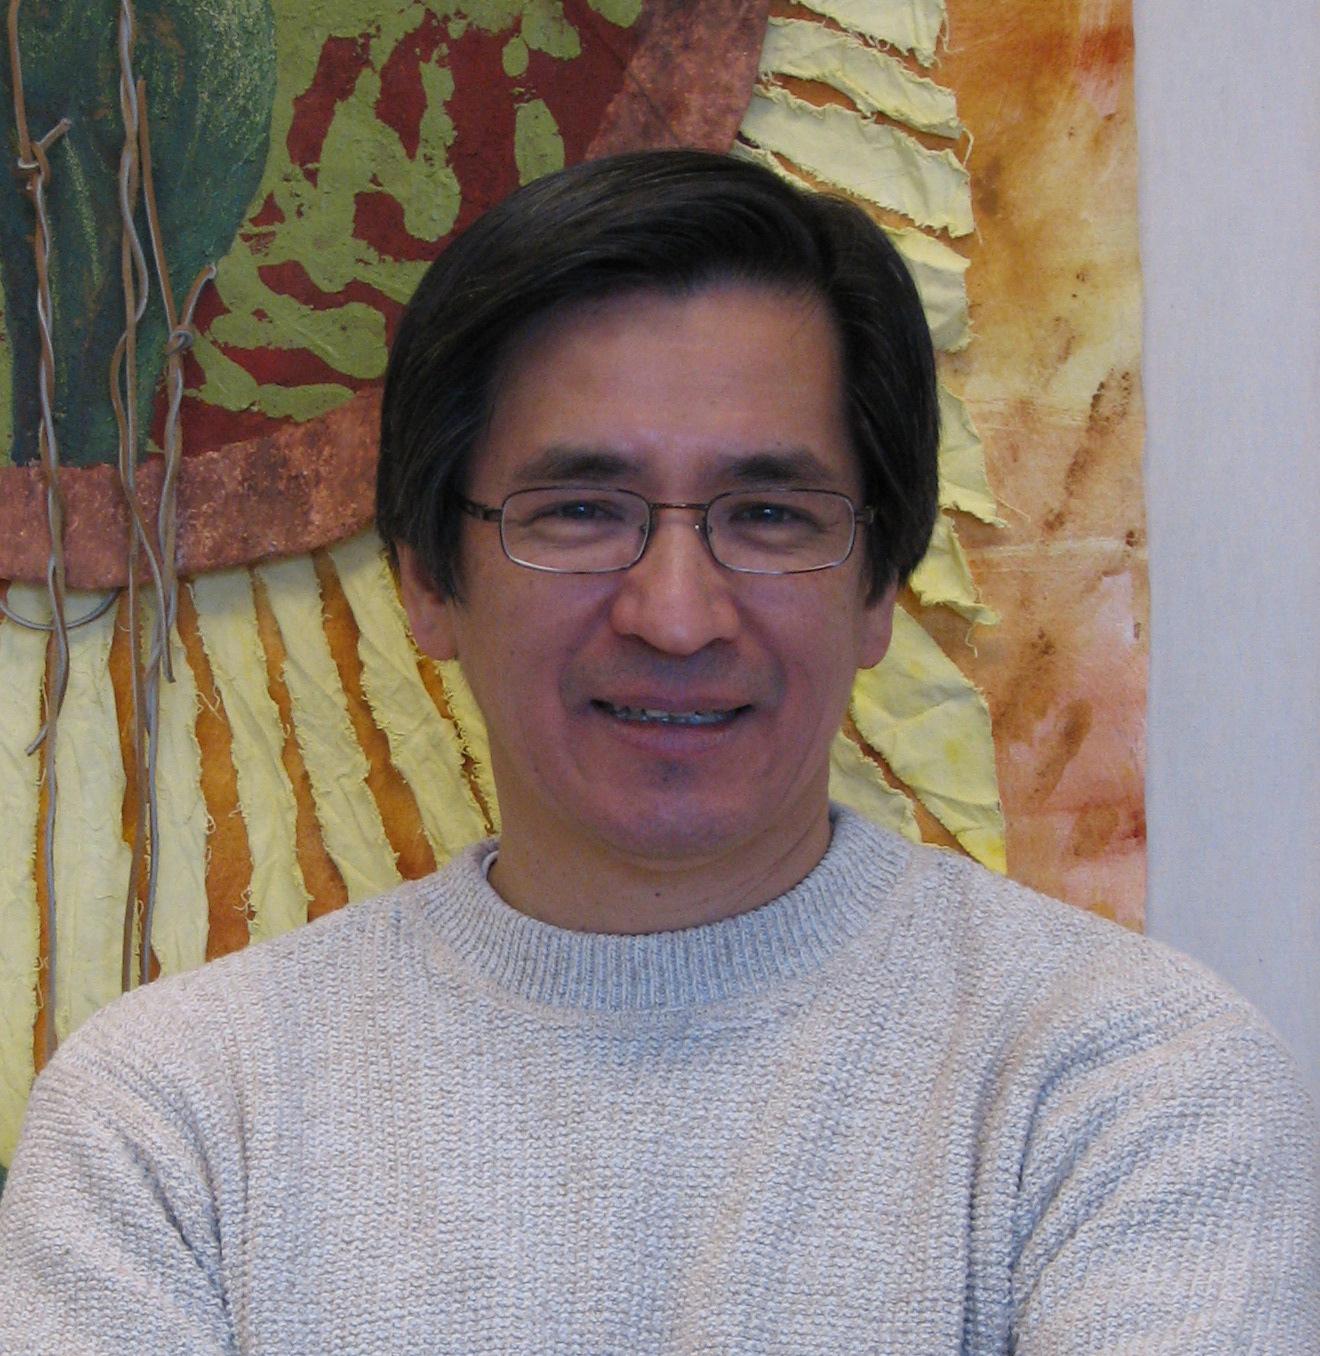 Bernard Perley